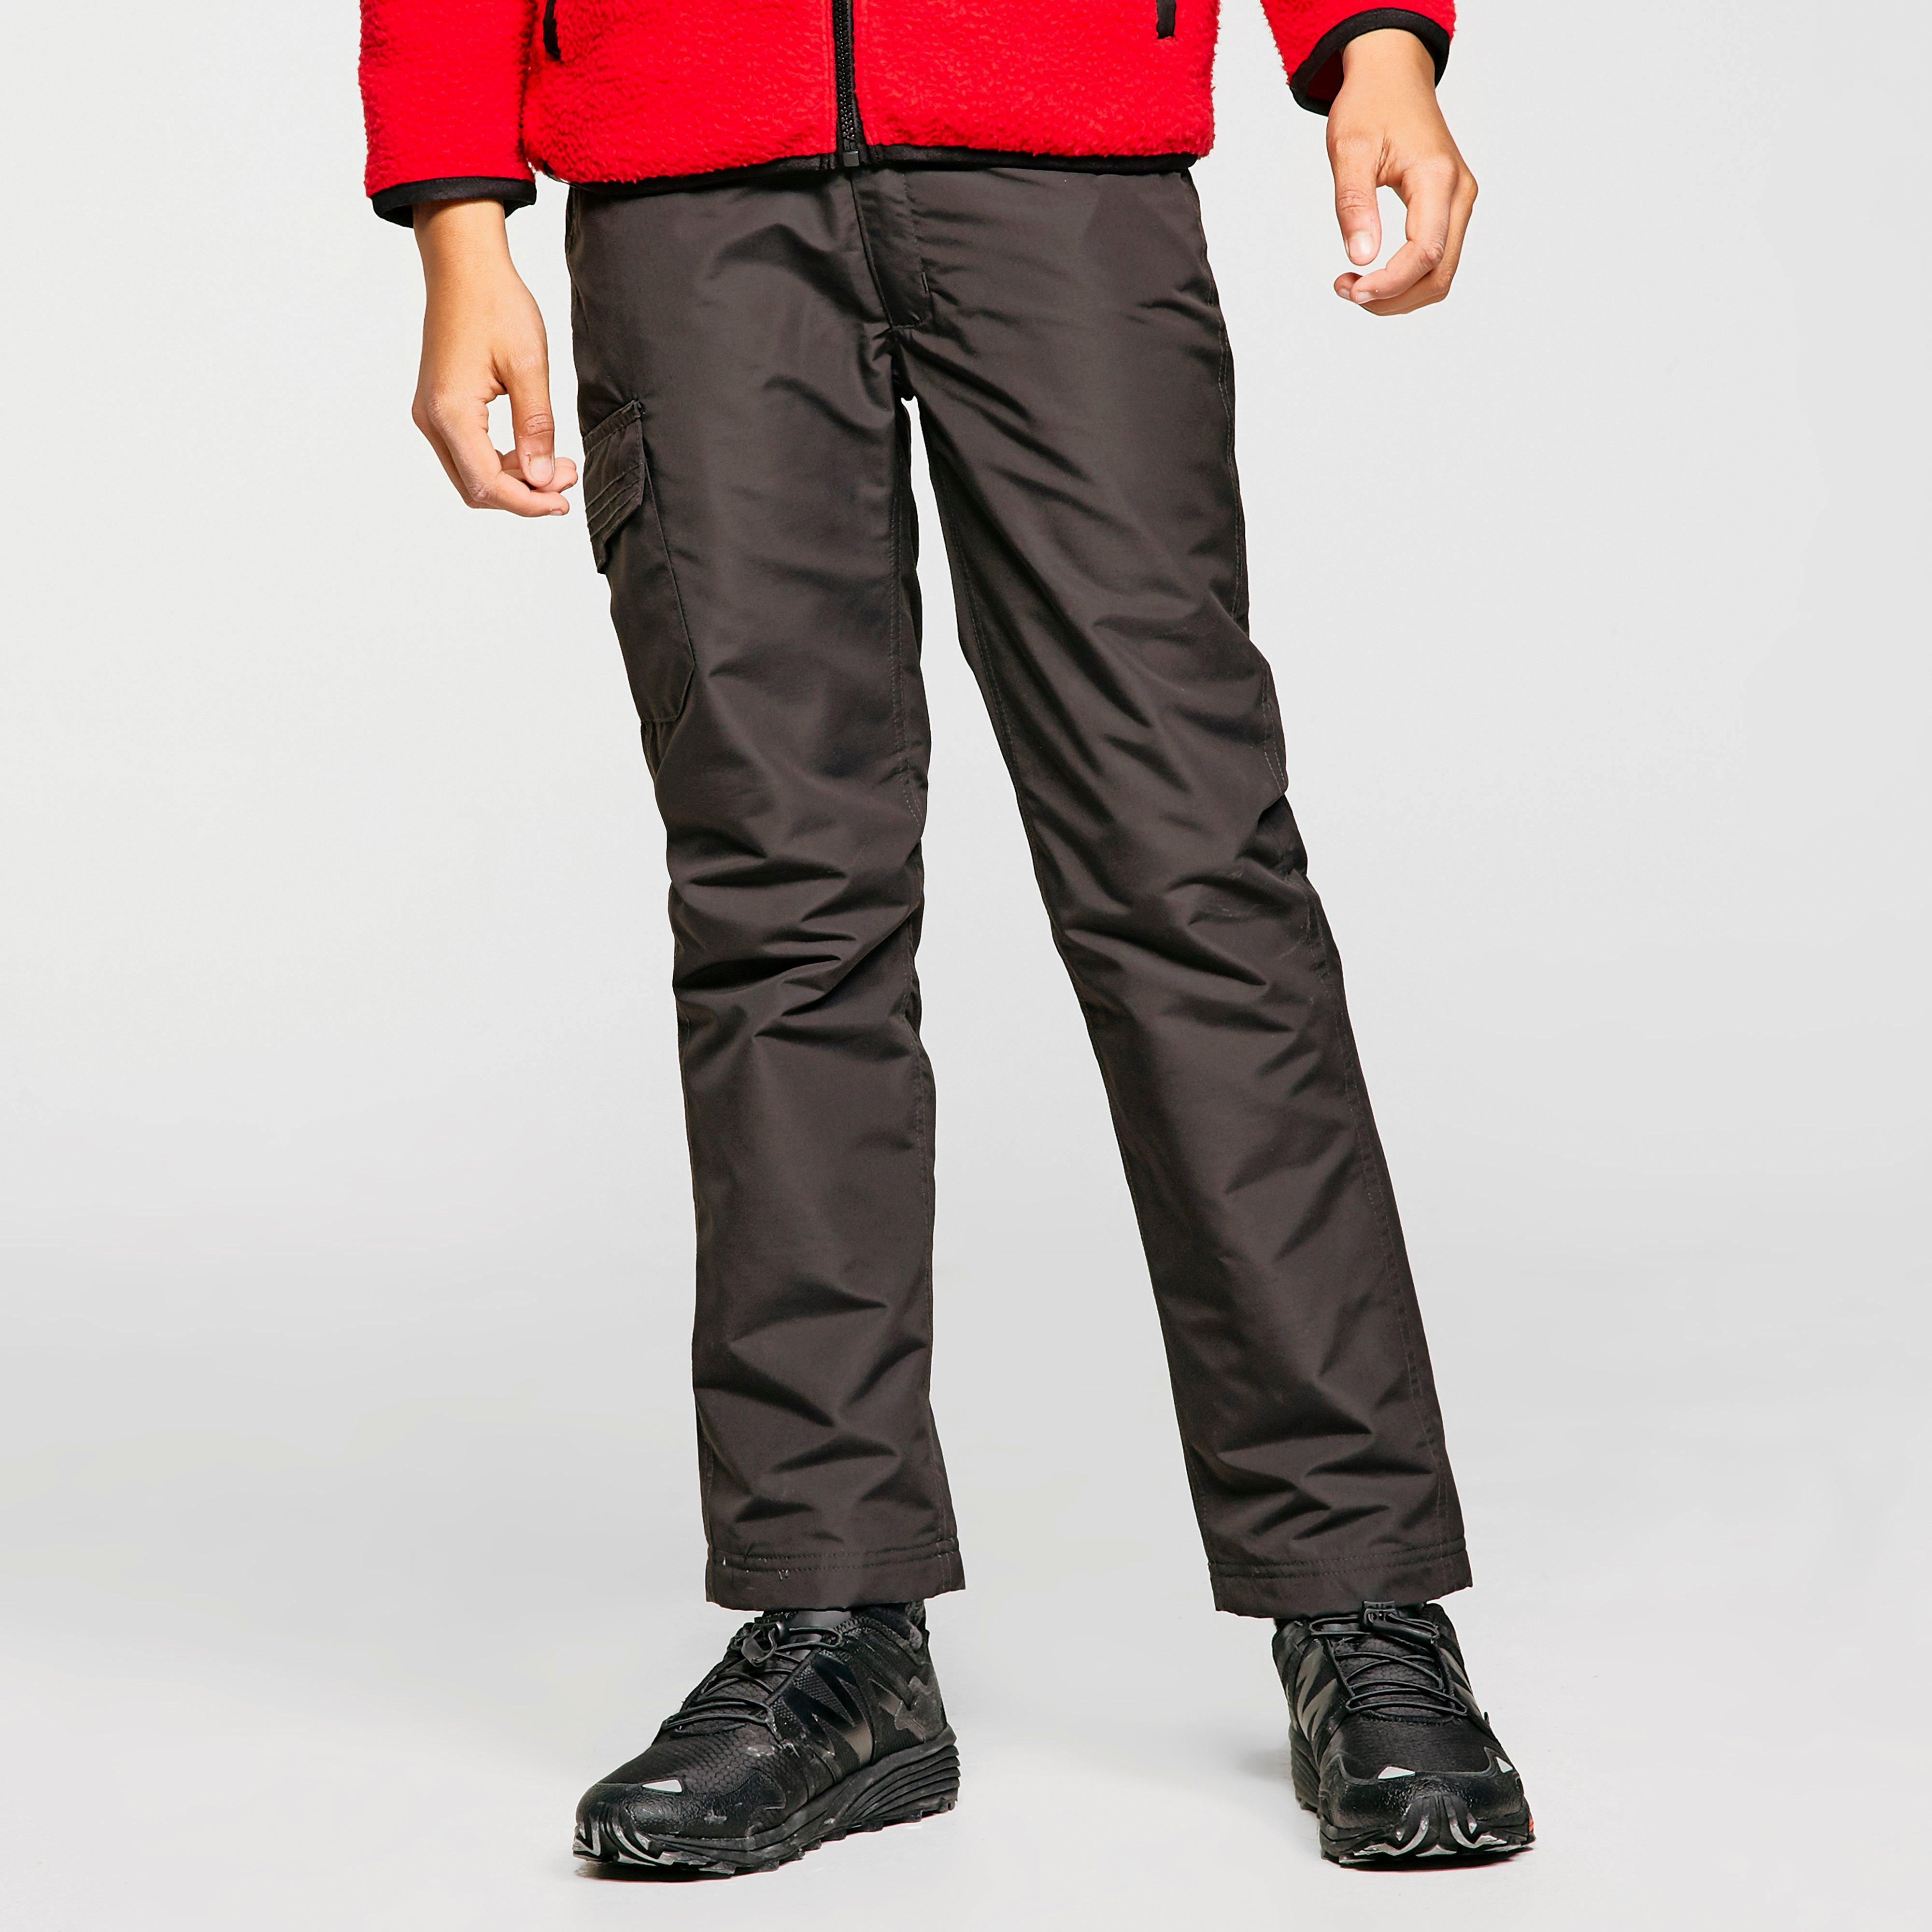 Regatta Kids' Line Sorcer Trousers - Grey/Grey, Grey